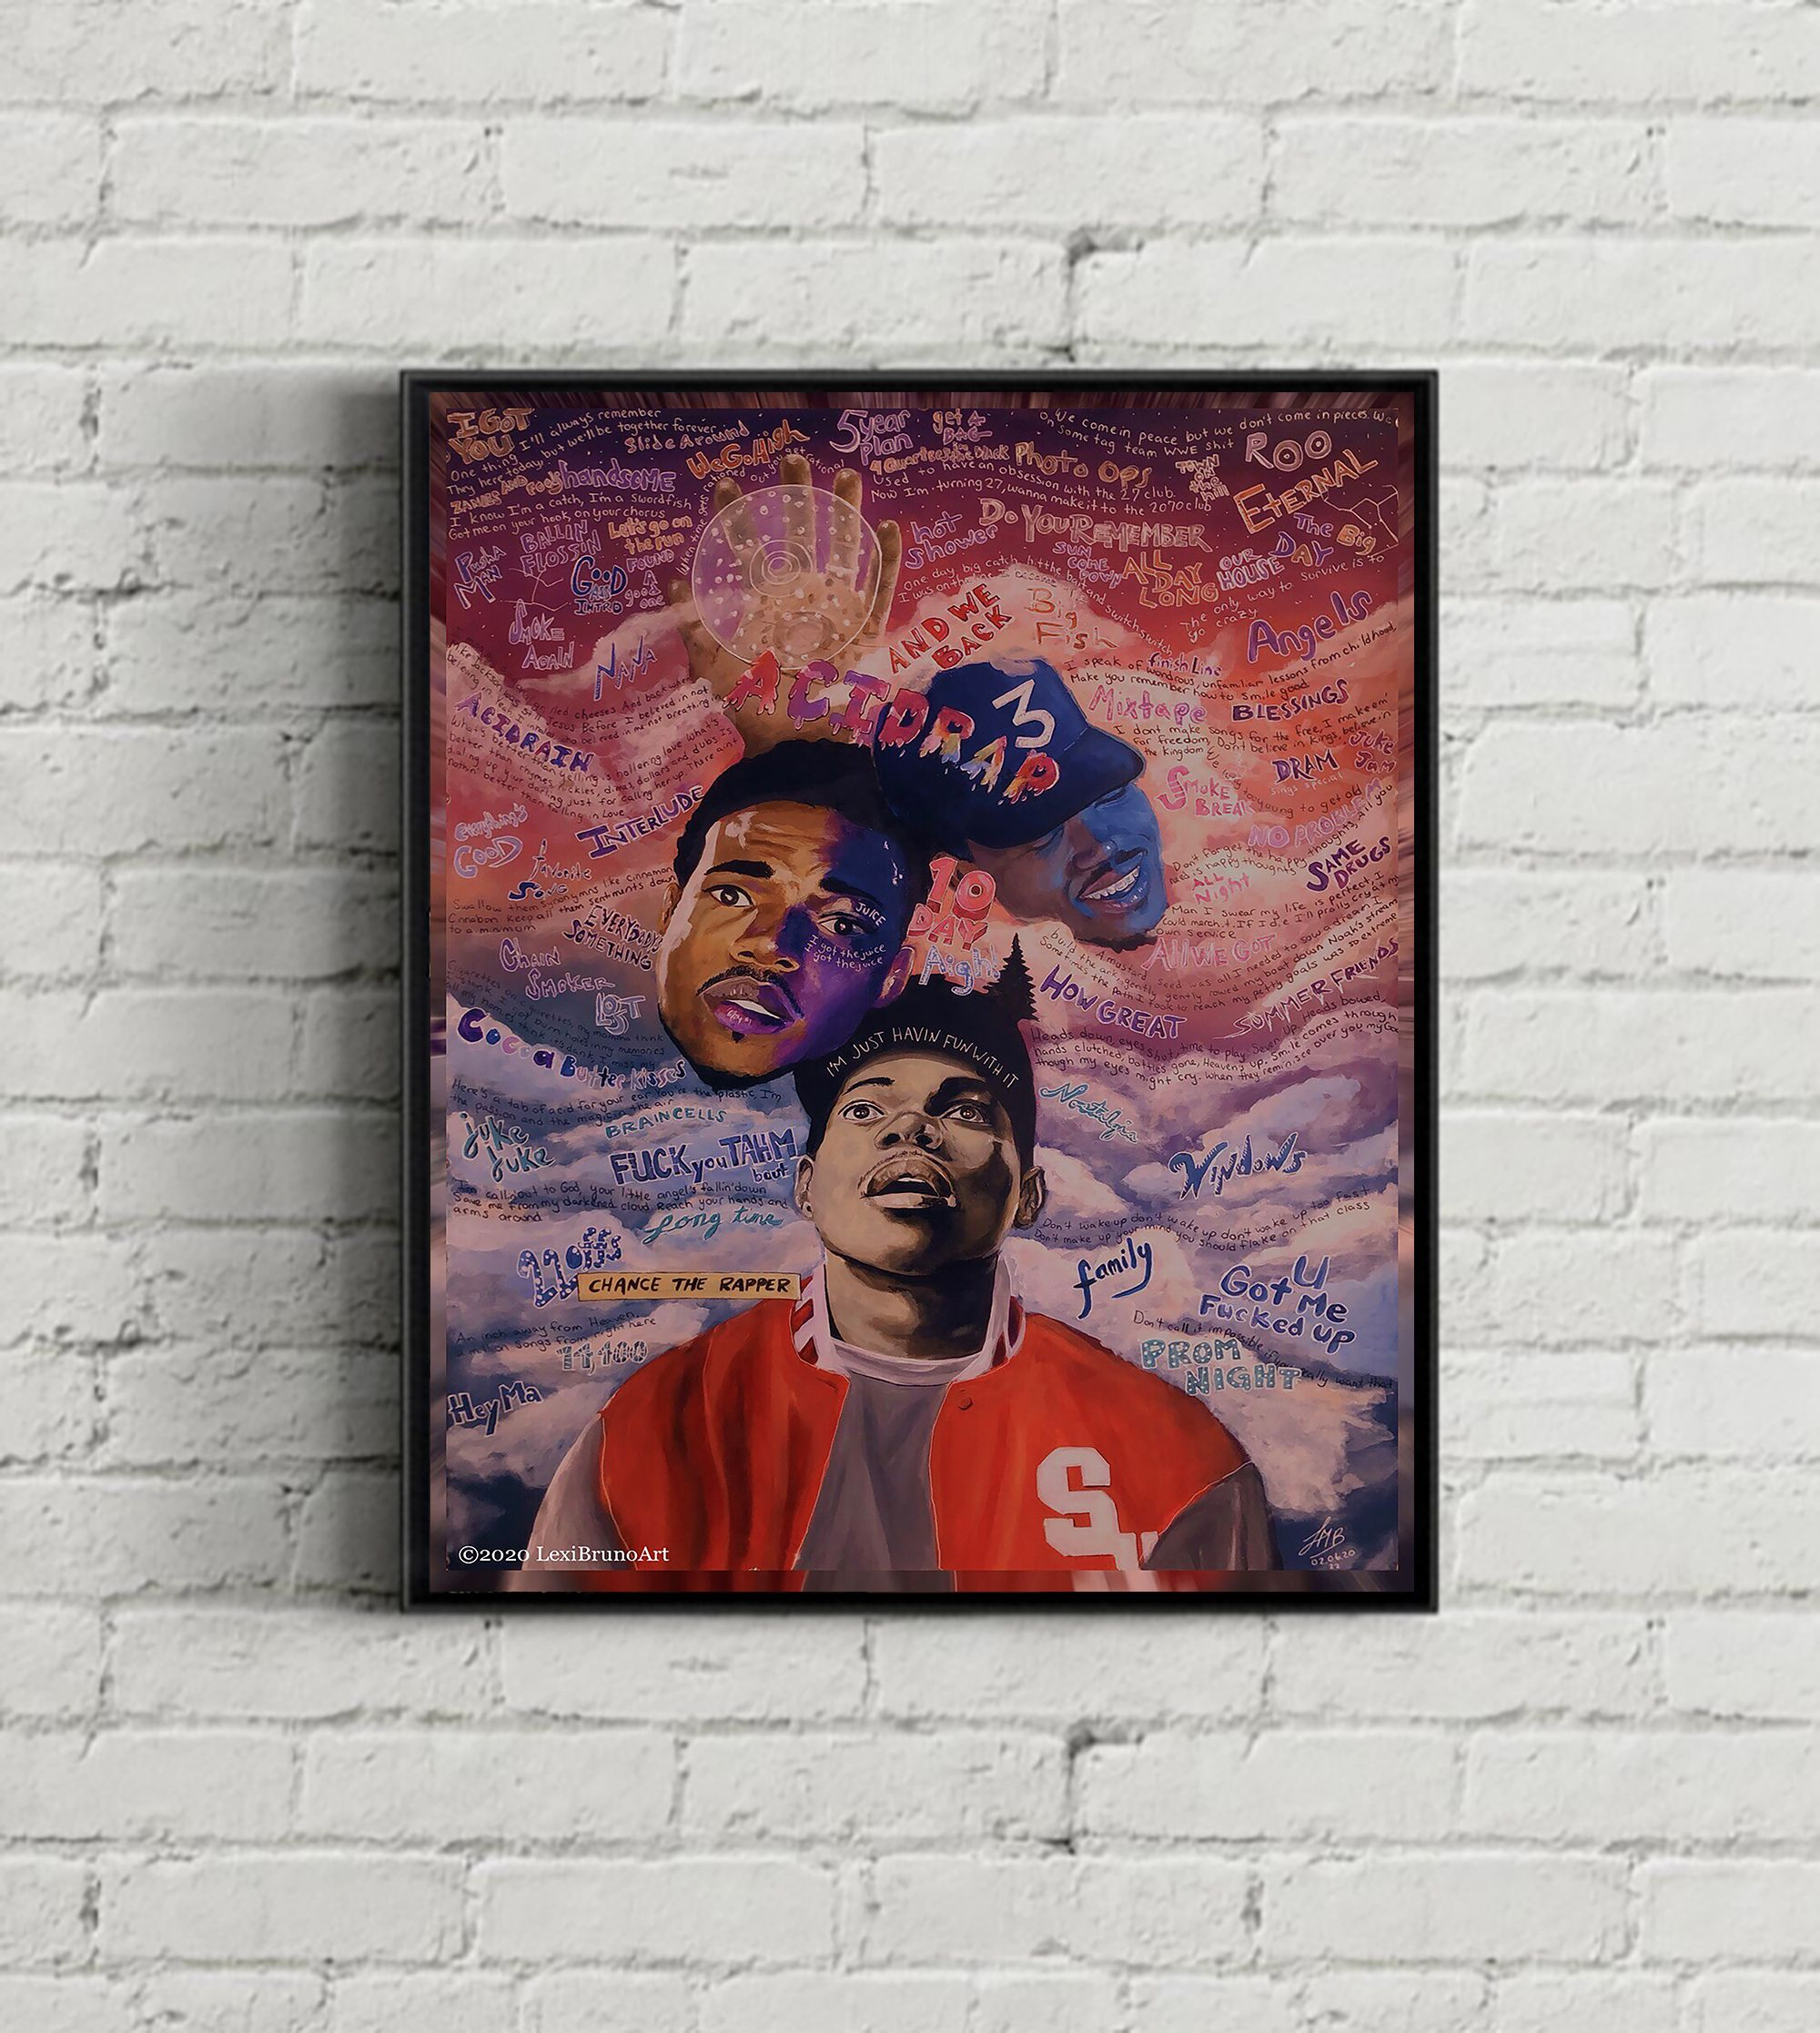 Chance The Rapper Poster Art Print Etsy Posters Art Prints Art Prints Poster Art